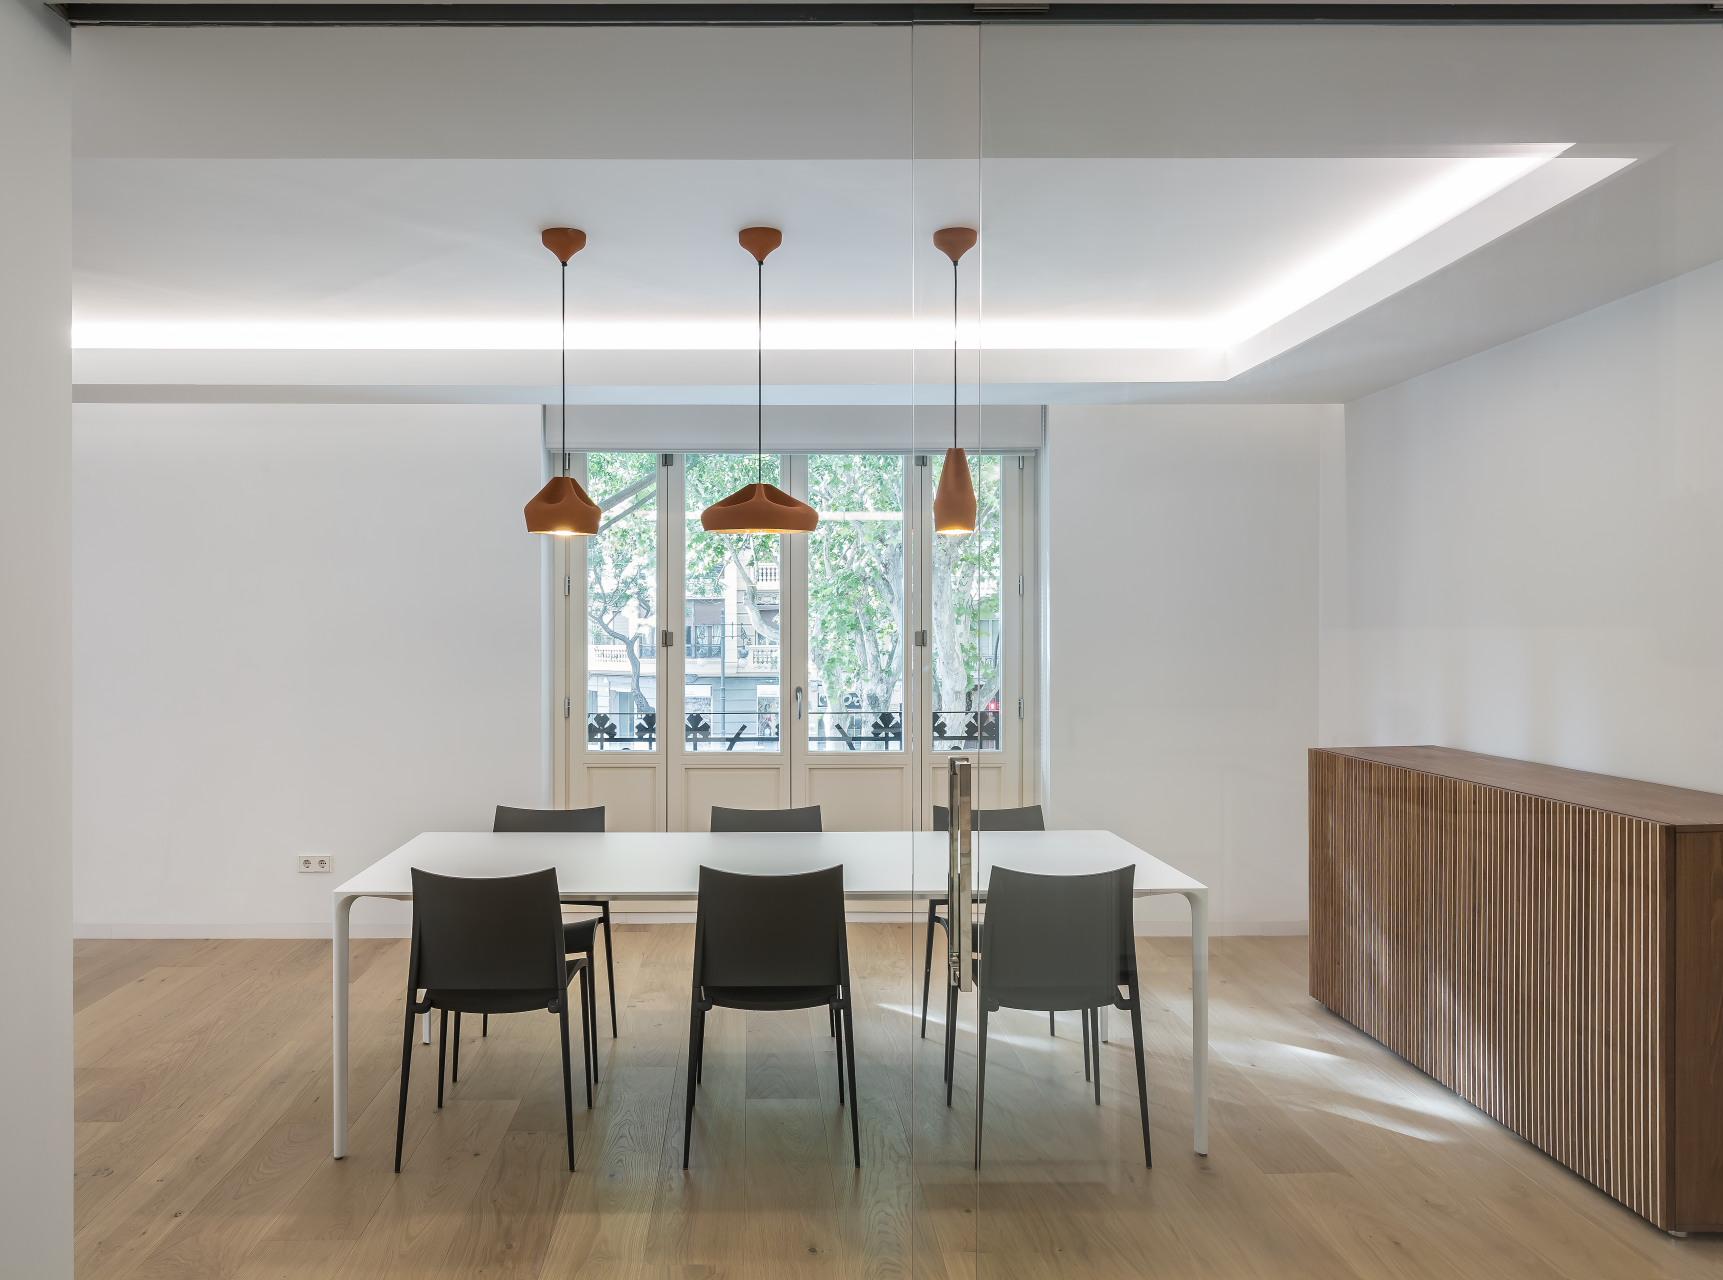 fotografia-arquitectura-interiorismo-valencia-german-cabo-gallardo-llopis-bfm-edificatoria-turia02 (11)